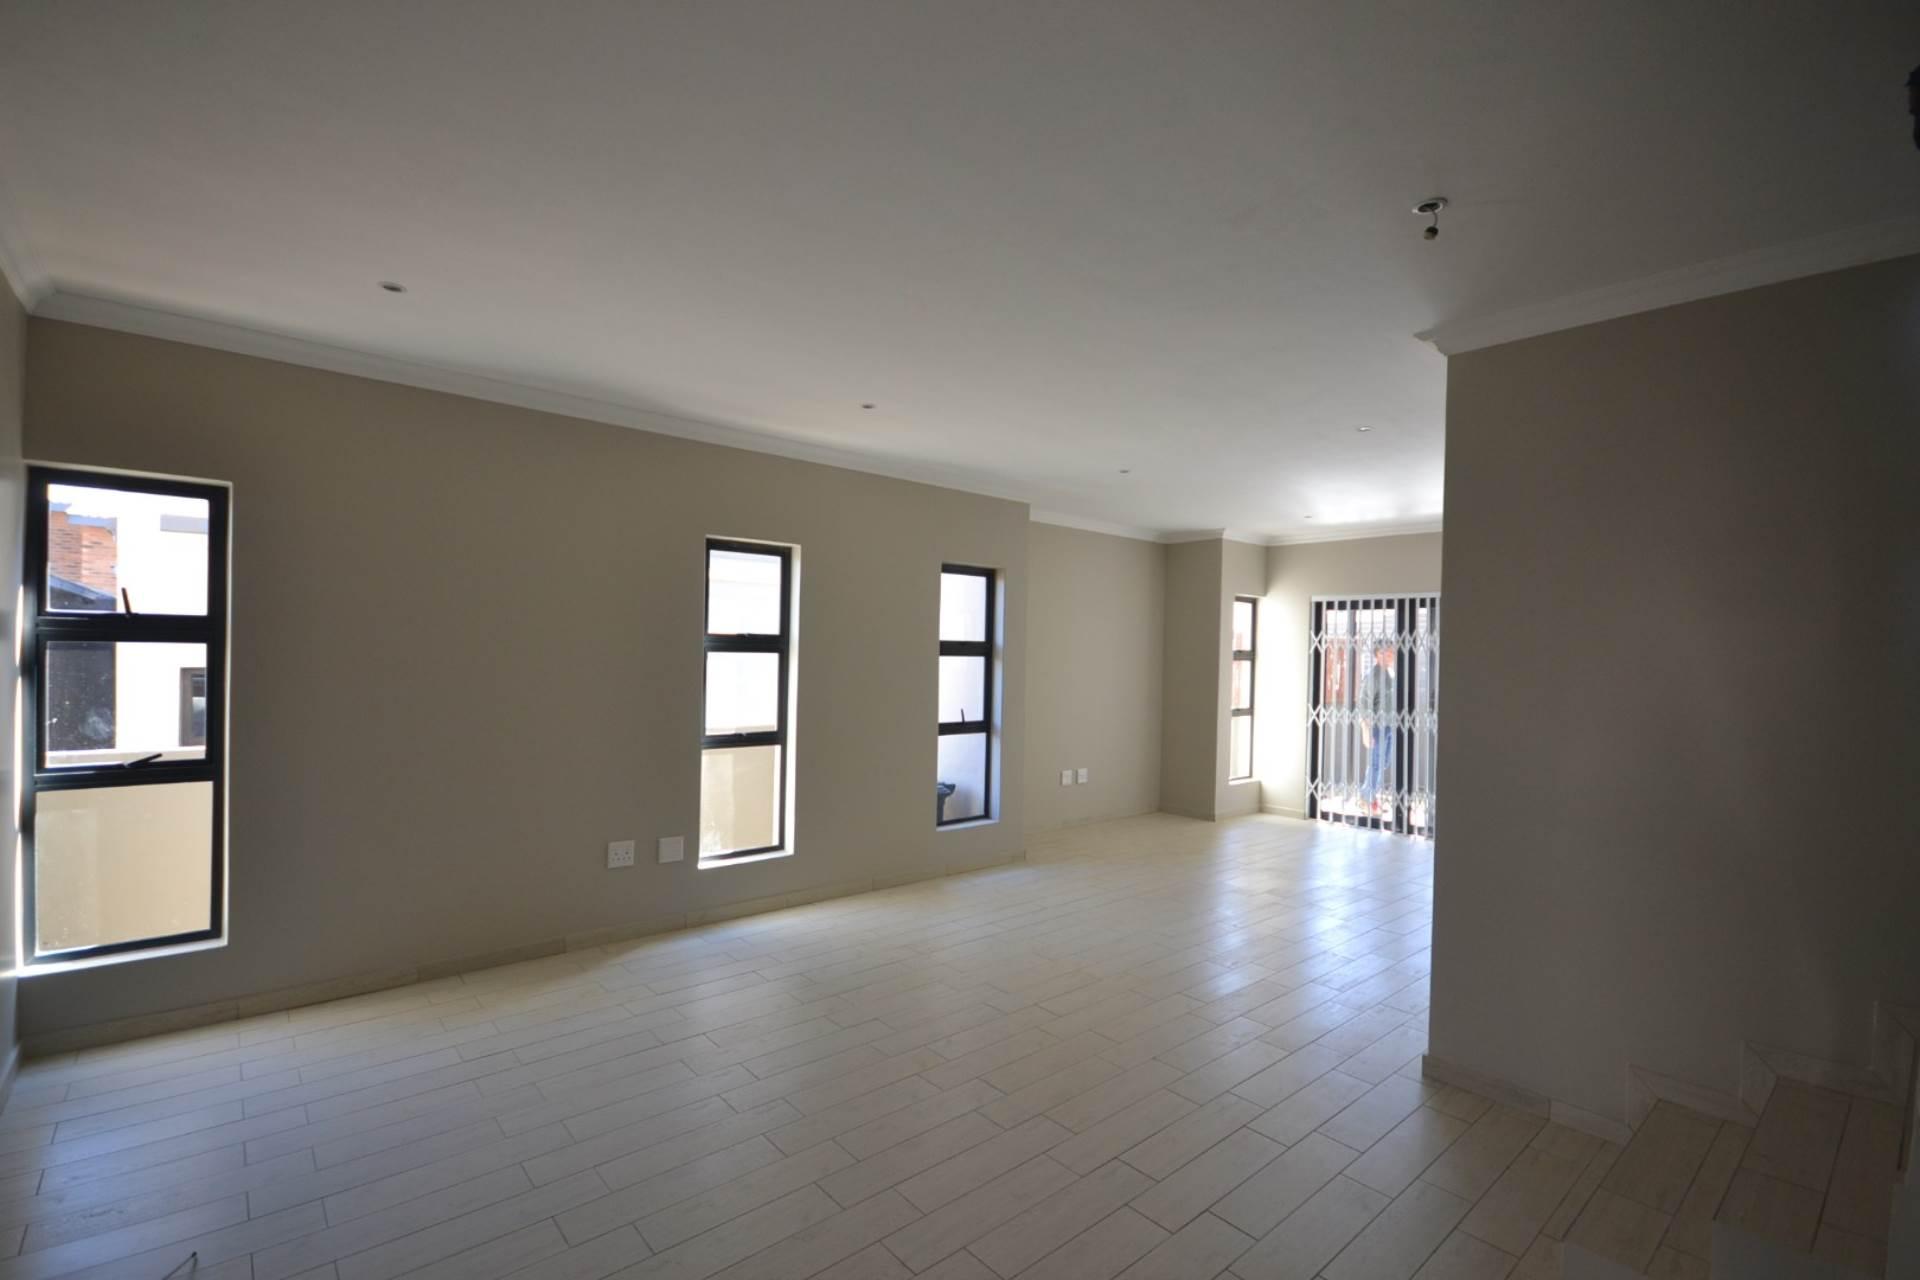 Faerie Glen property for sale. Ref No: 13587738. Picture no 13